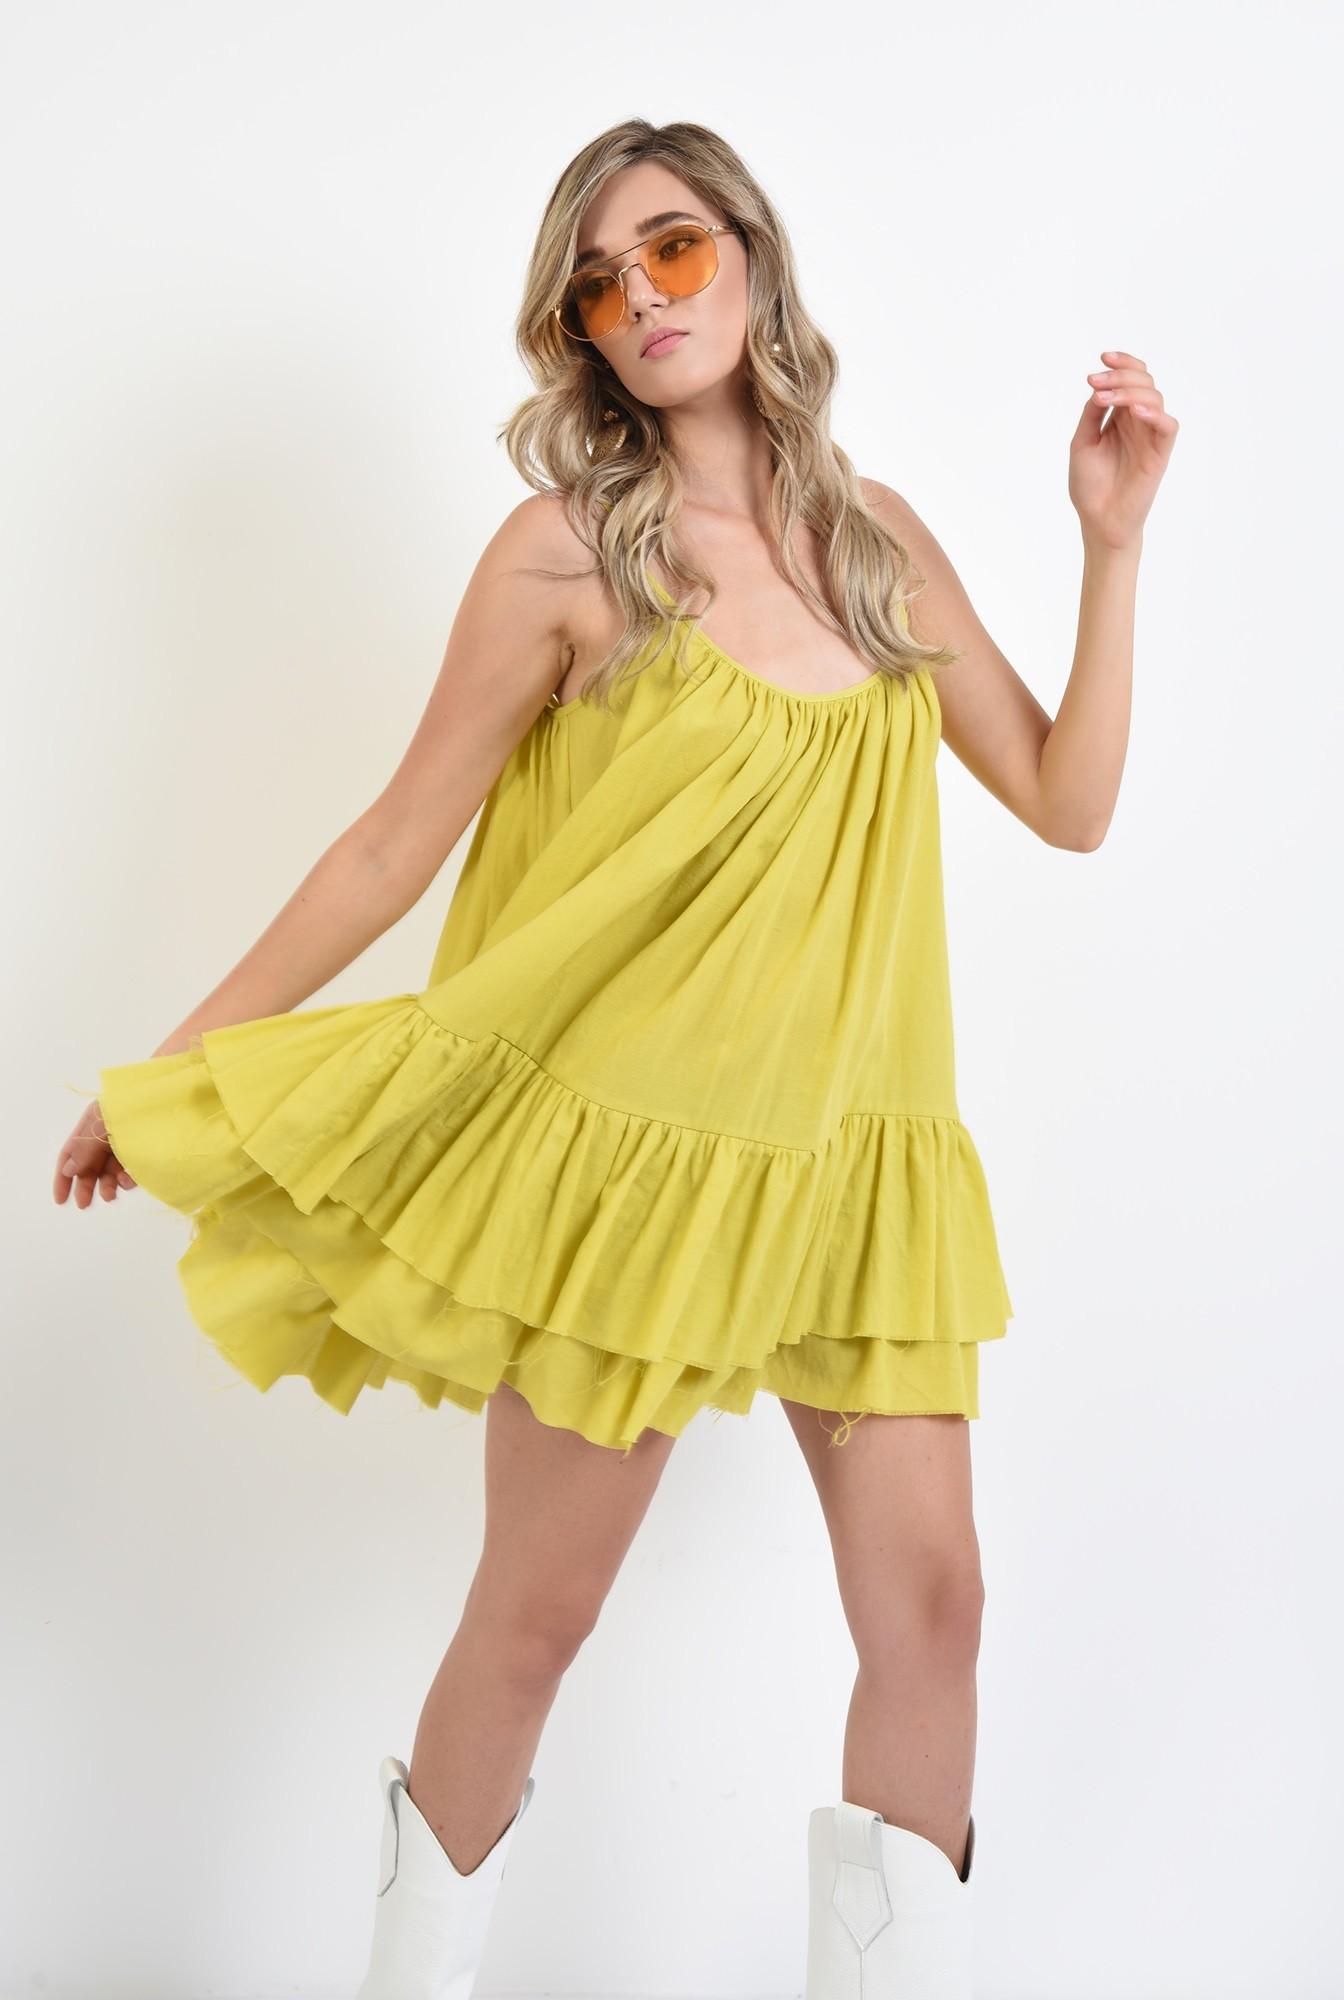 0 - 360 - rochie din bumbac, lime, bretele, volane, rochie evazata